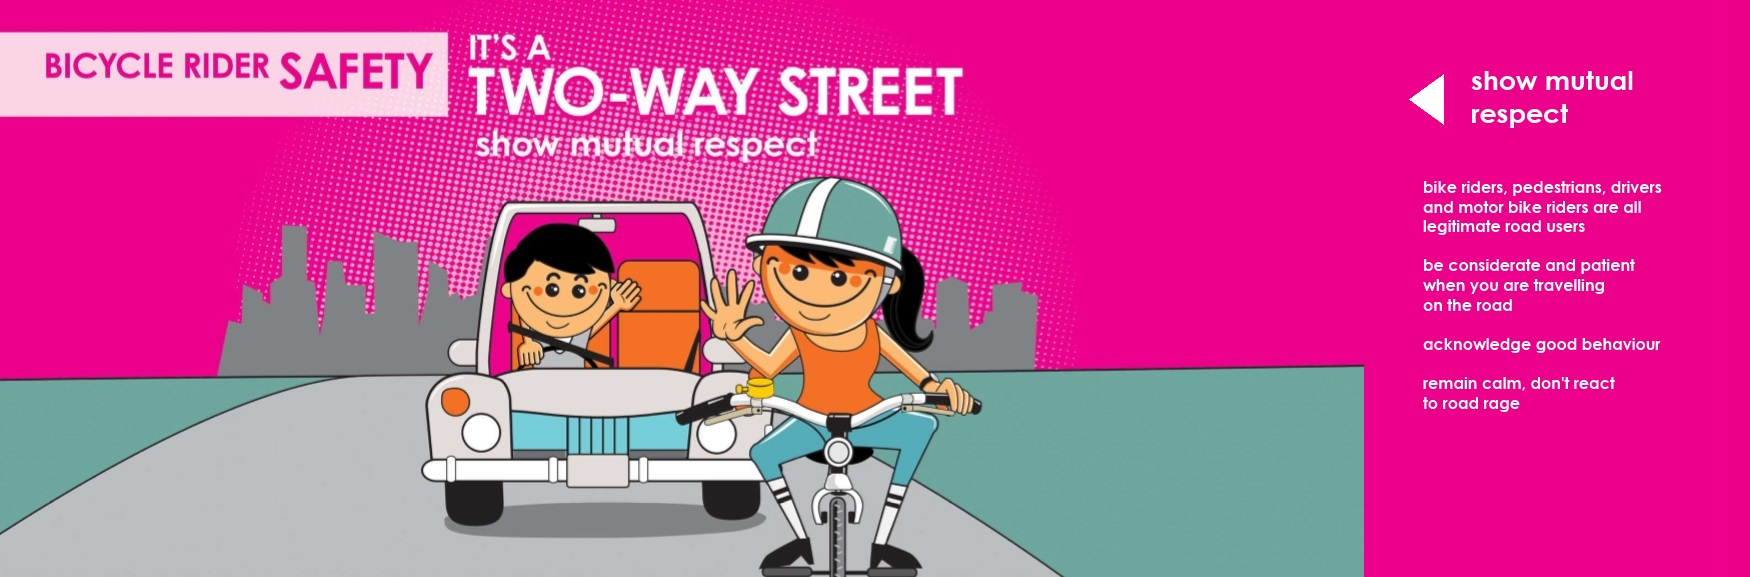 Mutual-respect-billboard-website